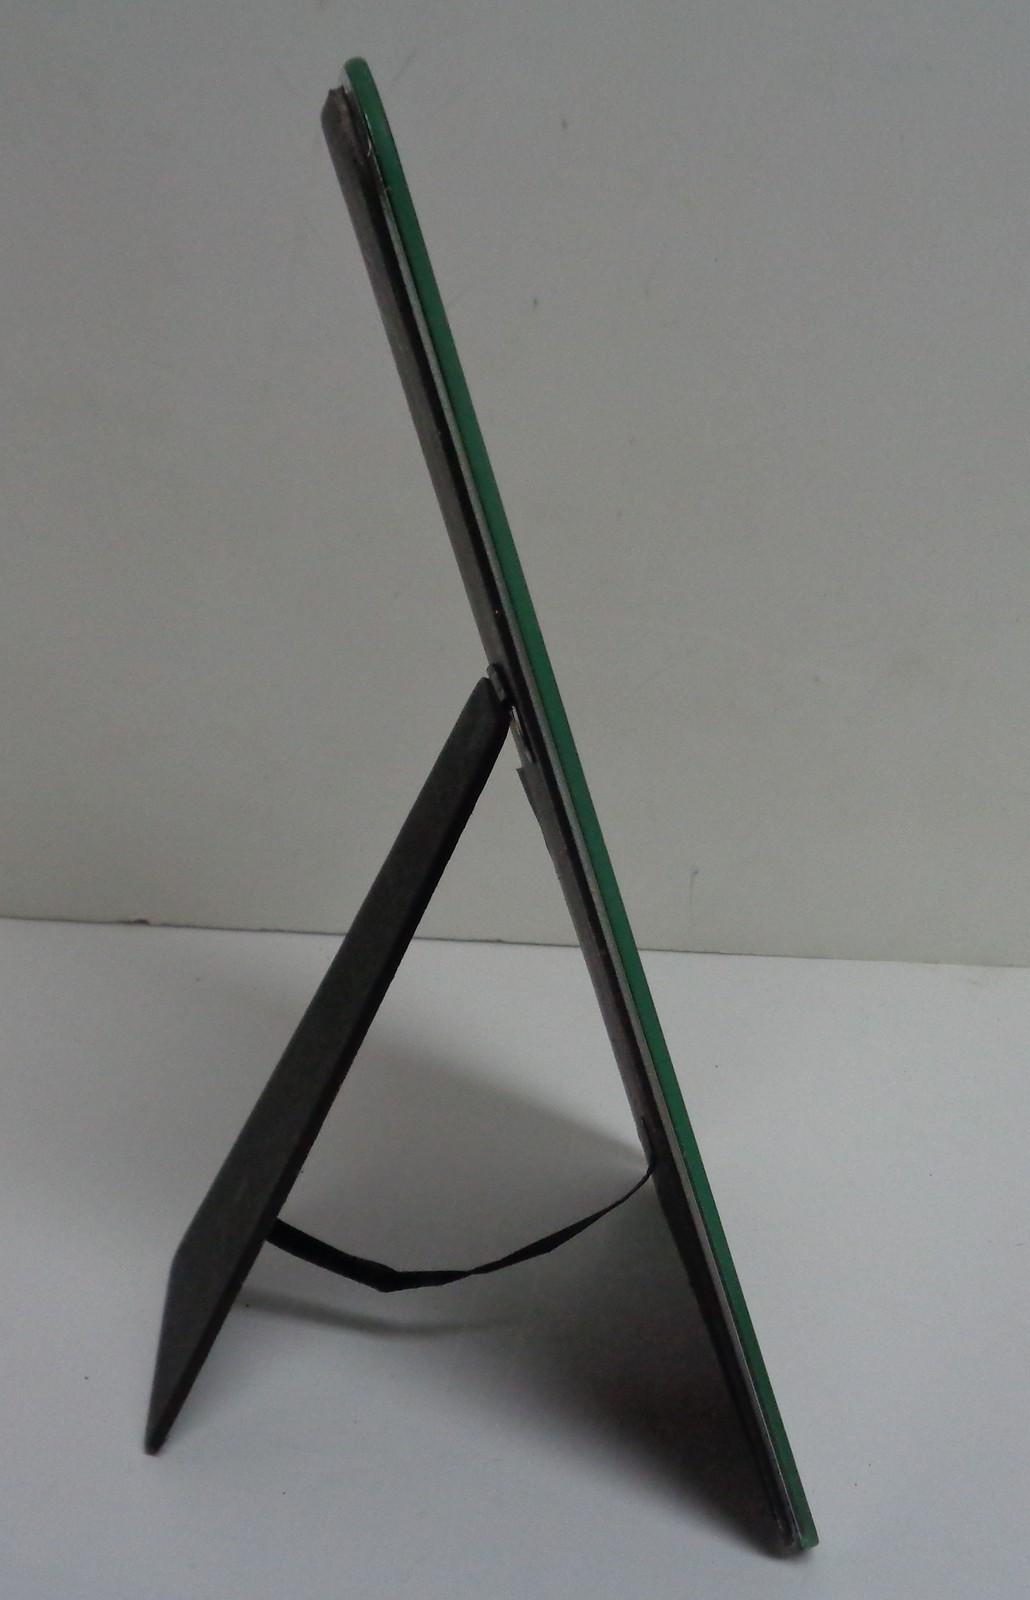 Large Smart Phone Photo Frame 5x7 Photo 10x6 Frame Green Trim NEW